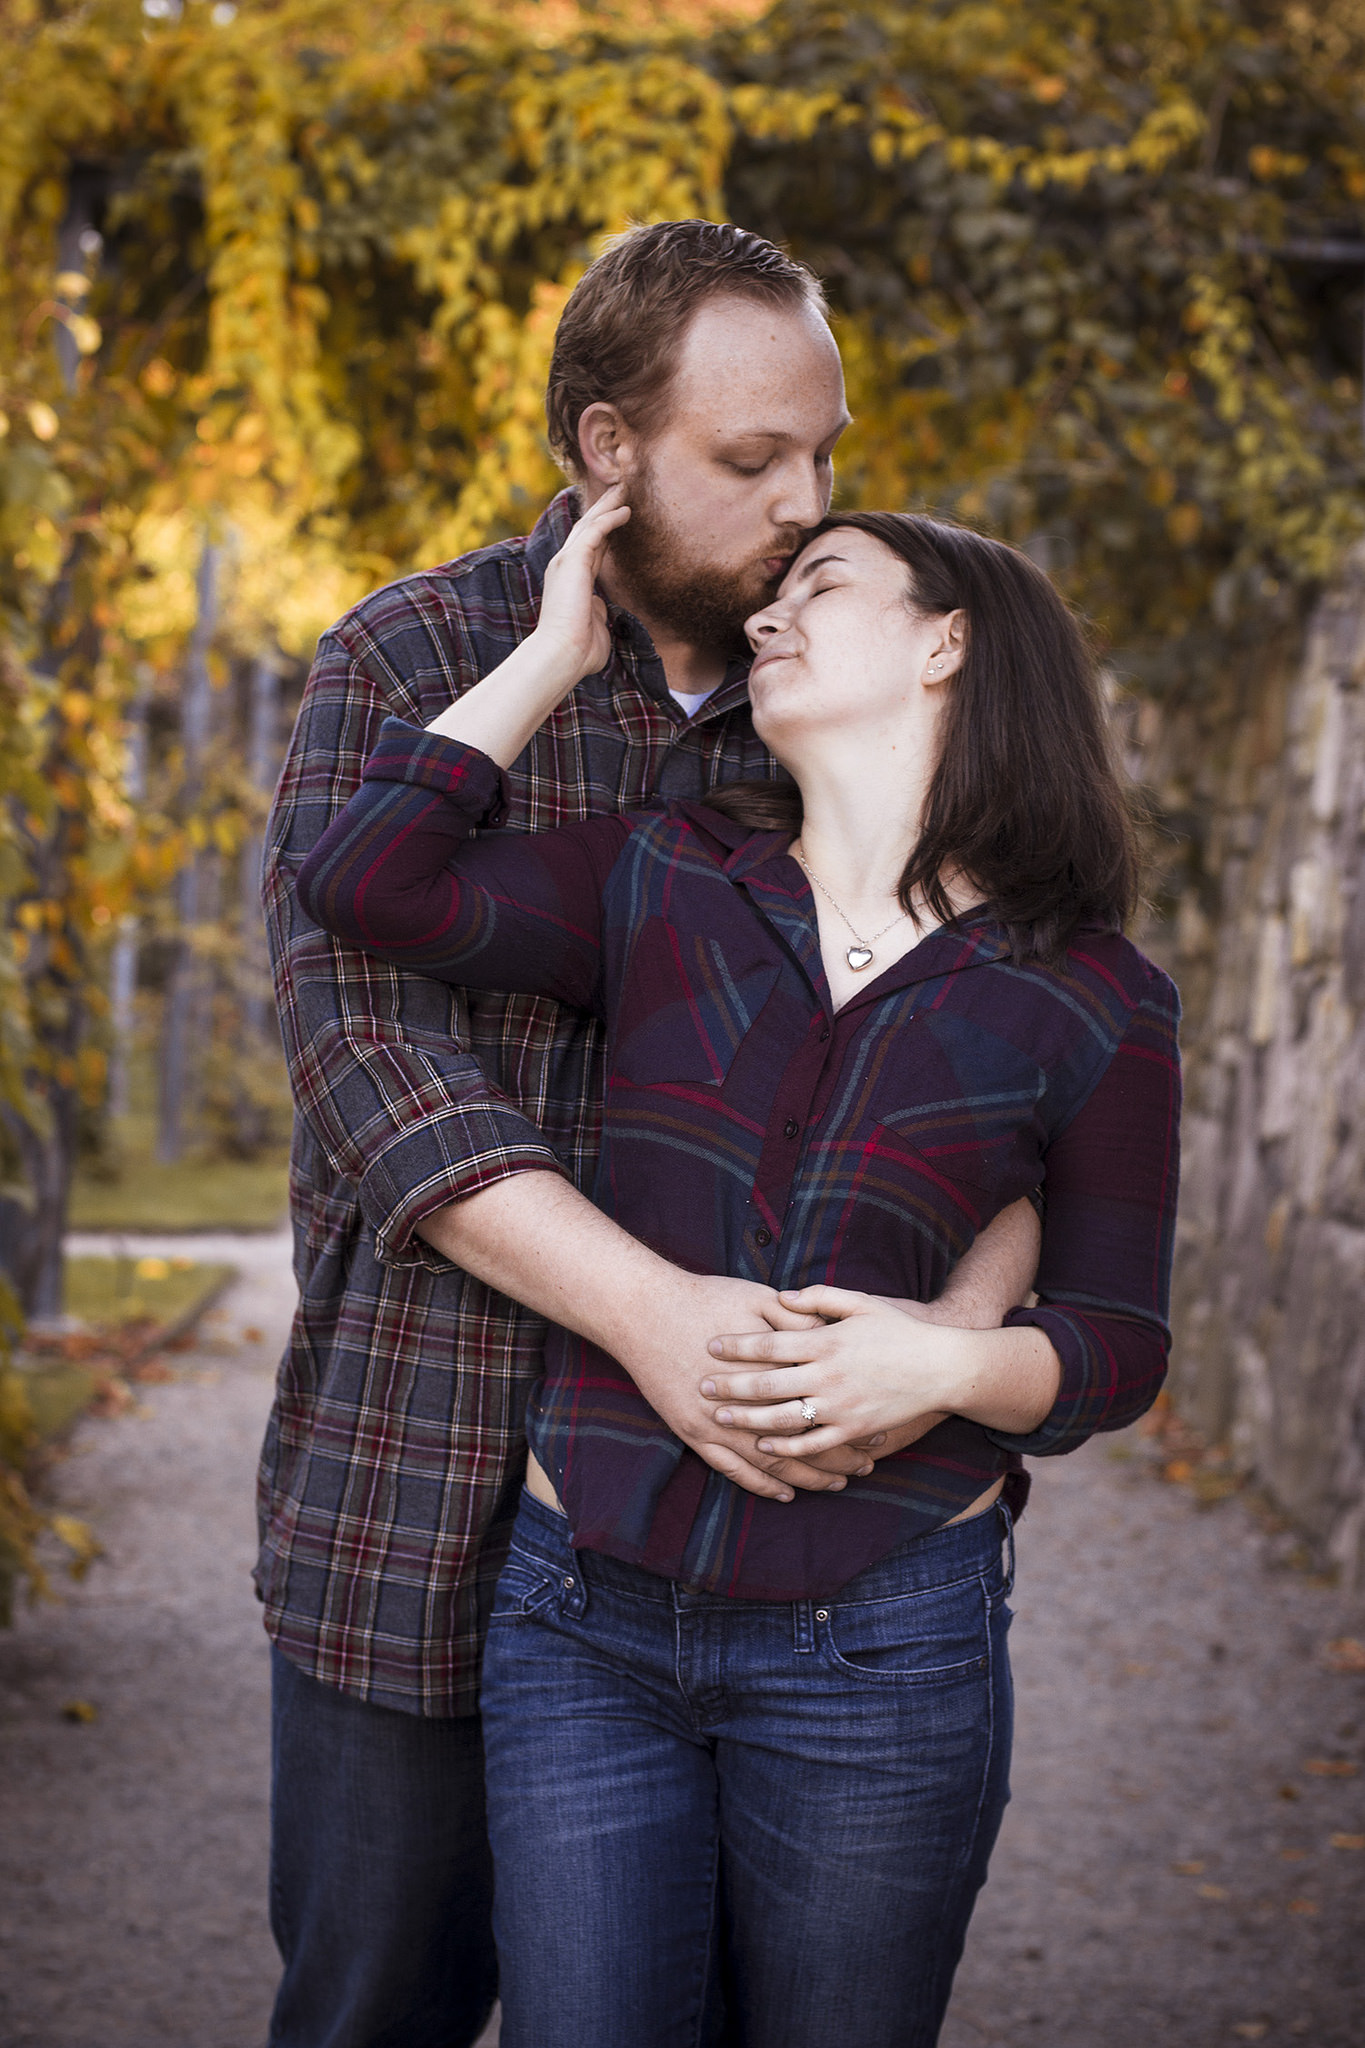 Photographed by Sarah C. Wilson -  www.sarahcwilson.com